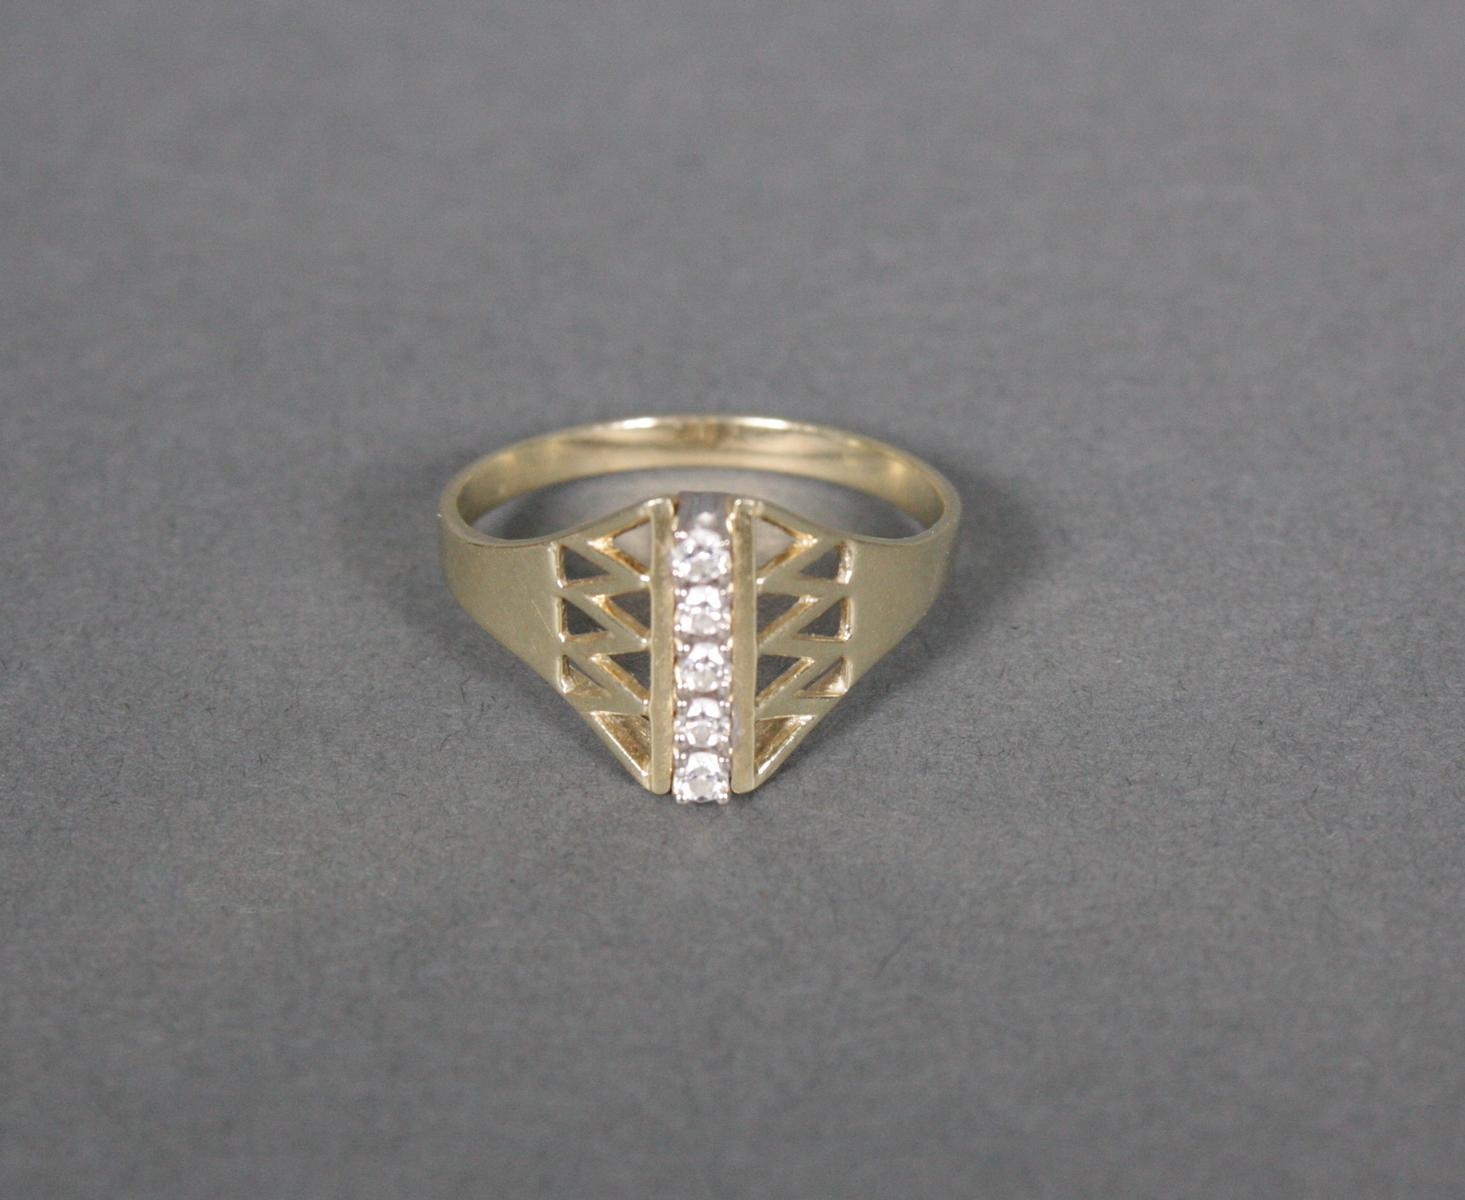 Damenring mit Diamanten, 14 Karat Gelbgold